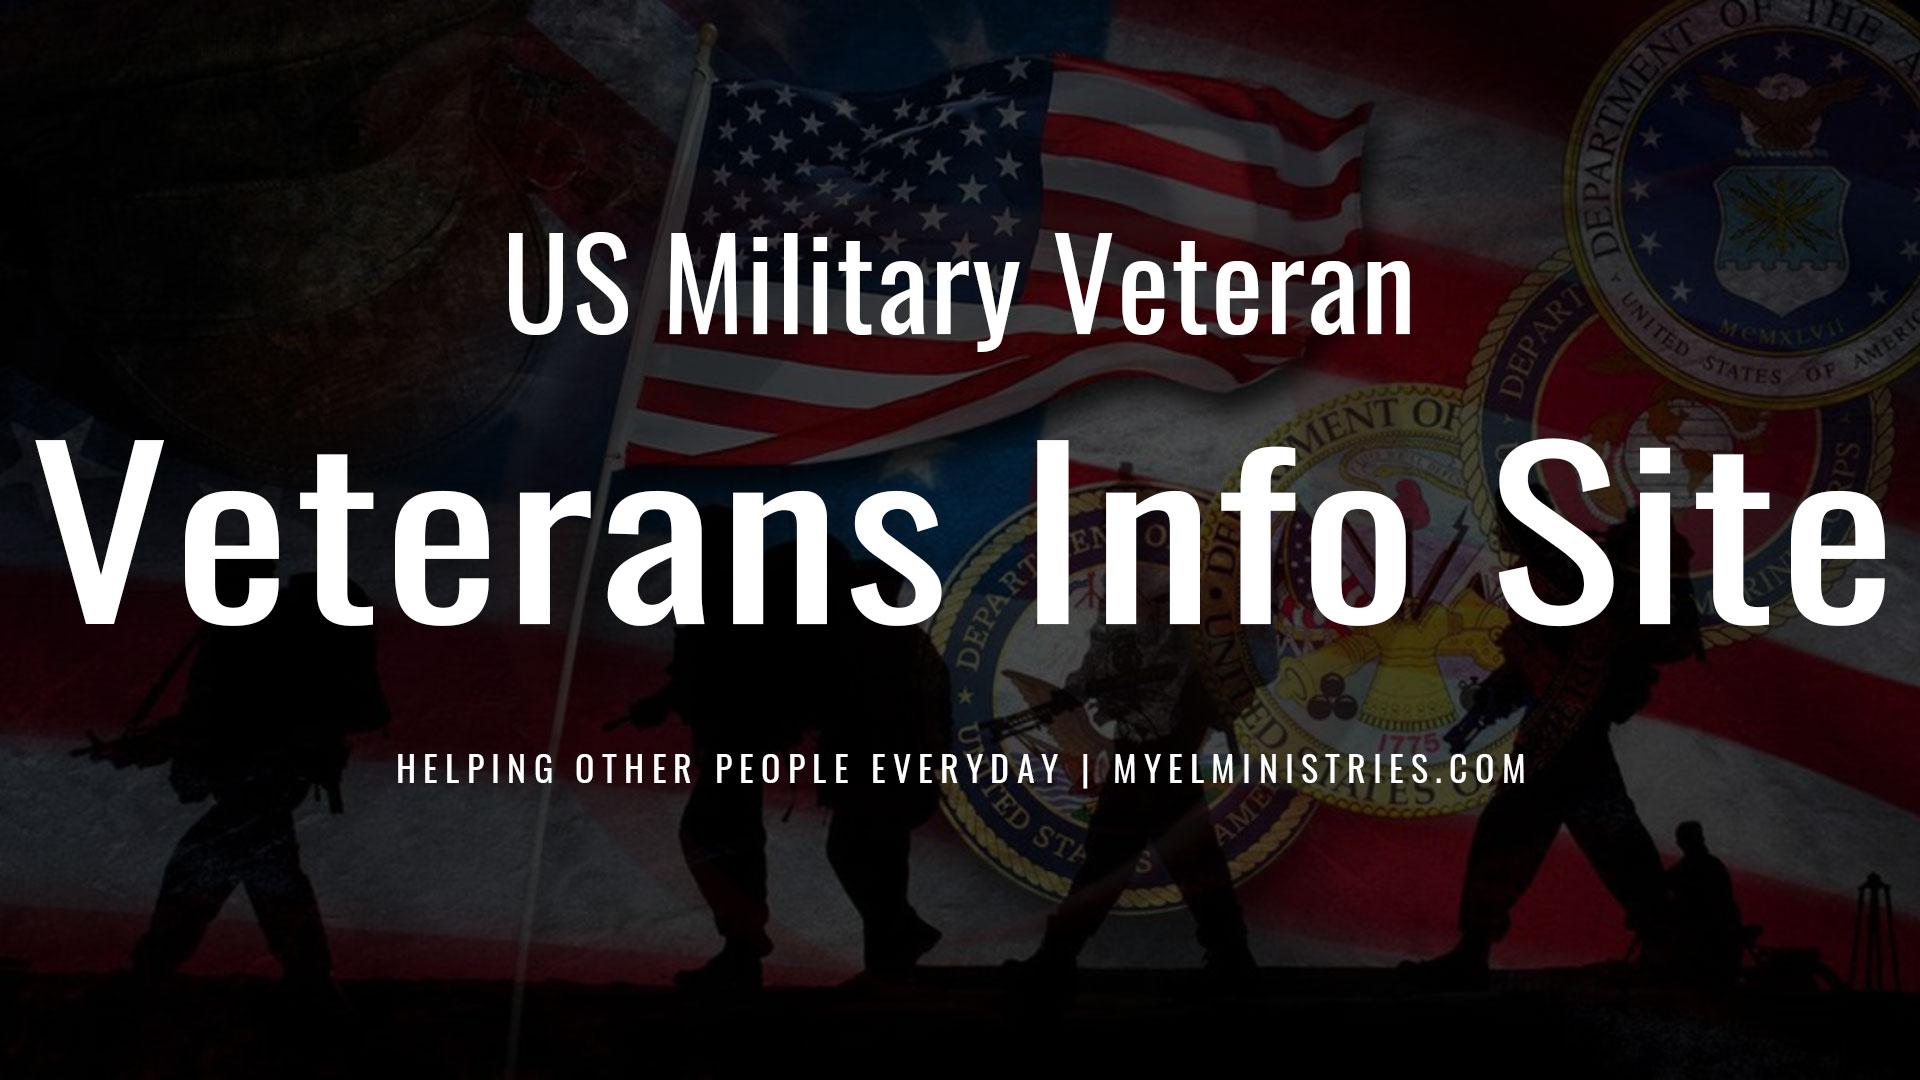 image for Veterans Information